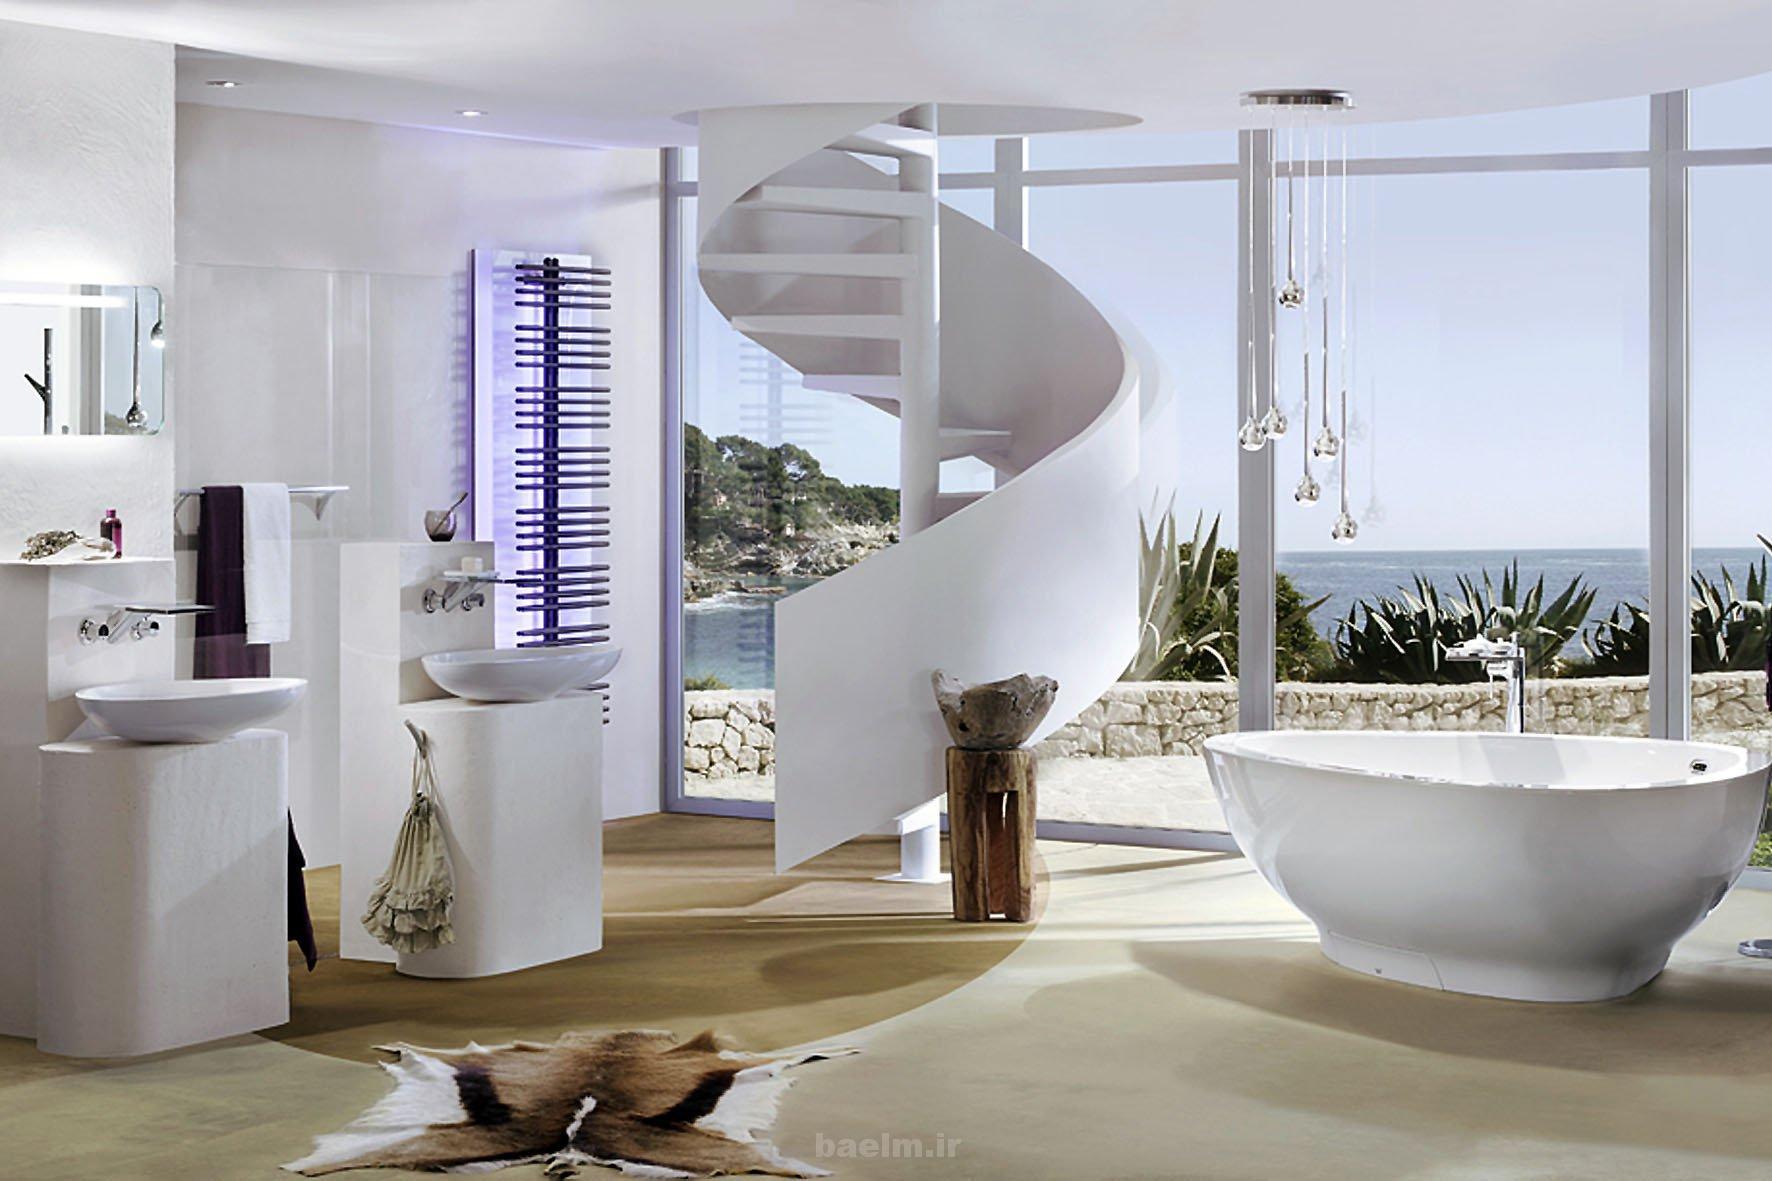 bathroom ideas 1 Bathroom Ideas